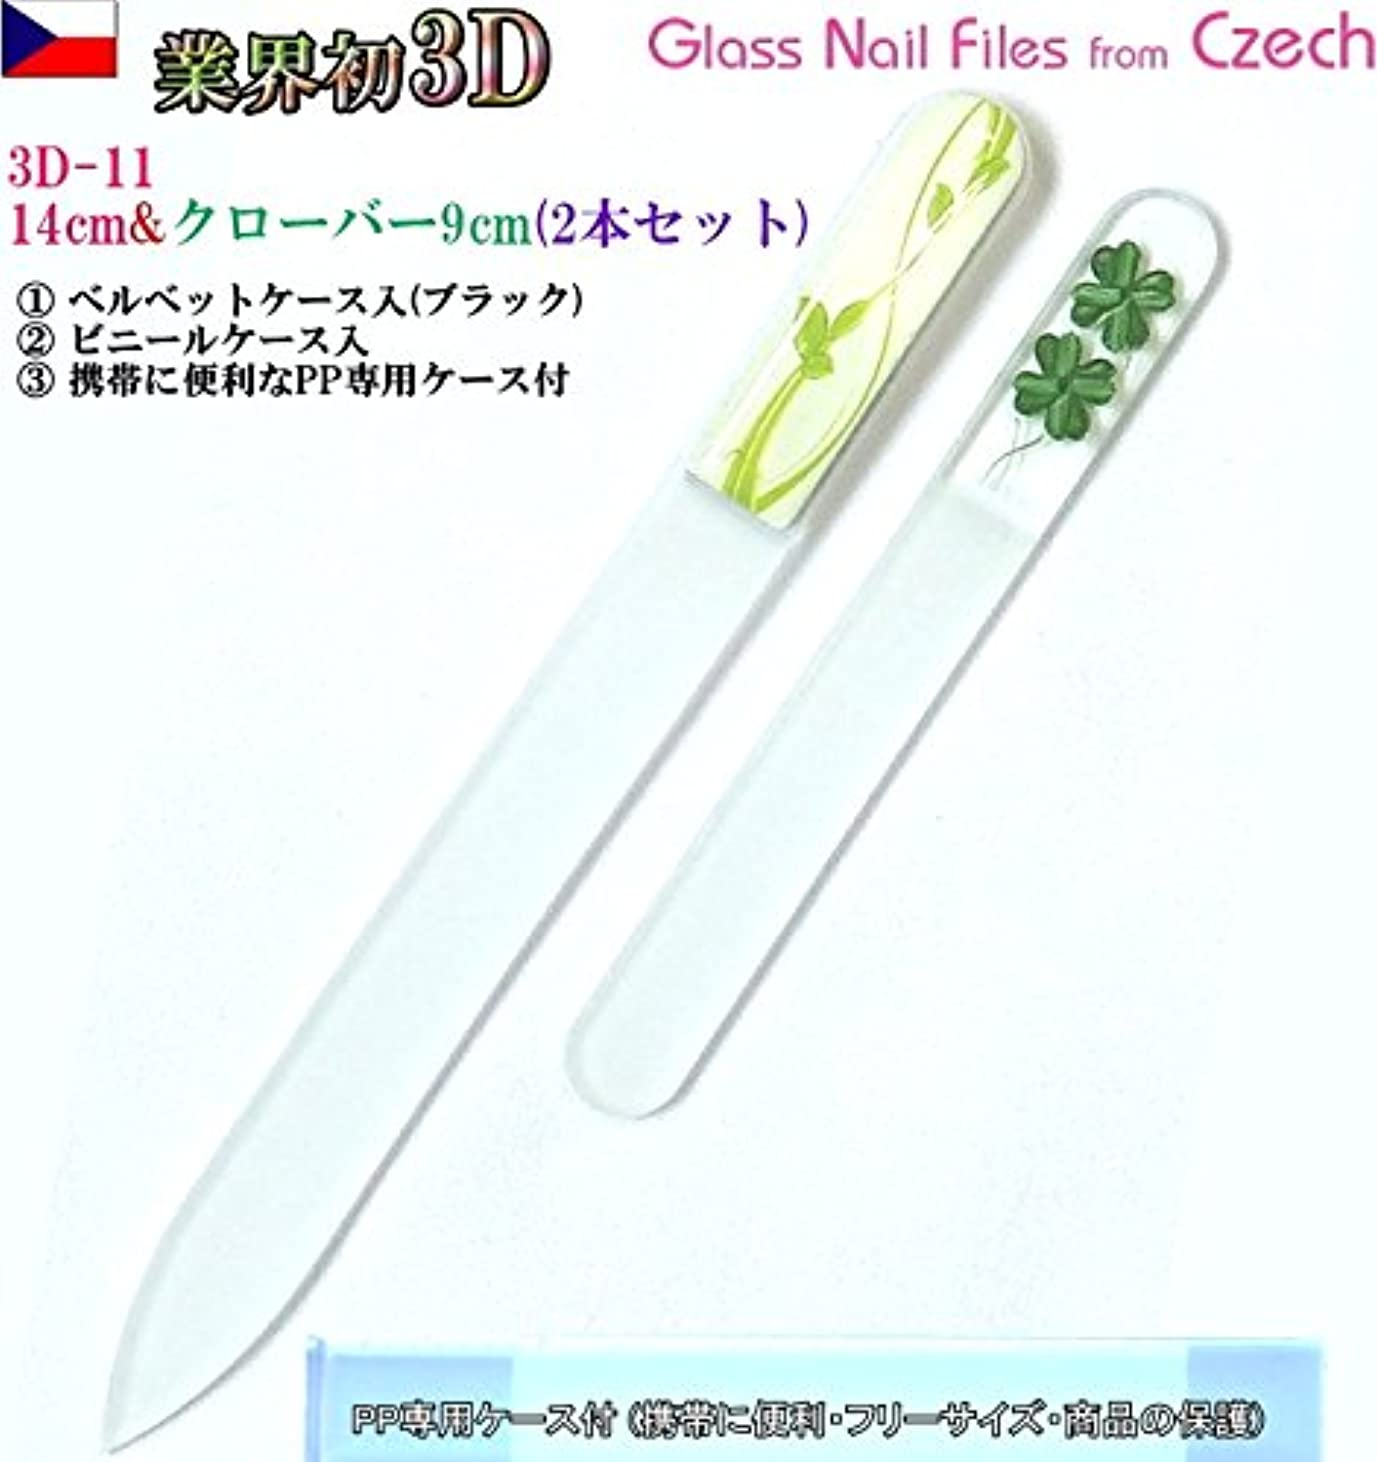 BISON 3D チェコ製ガラス爪ヤスリ 2Pセット M11&Sクローバー各両面仕上げ ?専用ケース付